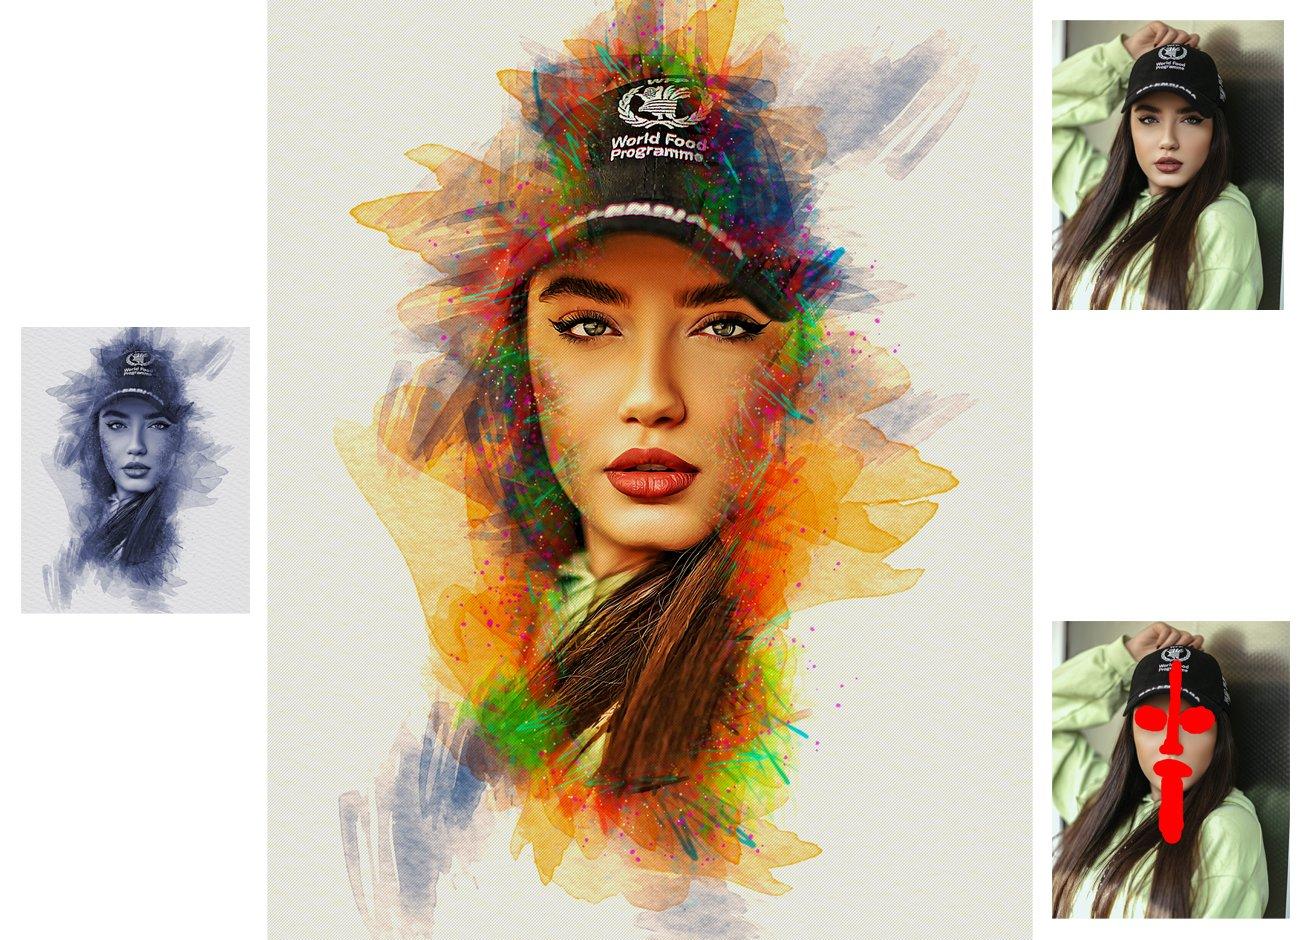 逼真水彩画效果照片处理特效PS动作模板 Watercolor Photoshop Action插图1